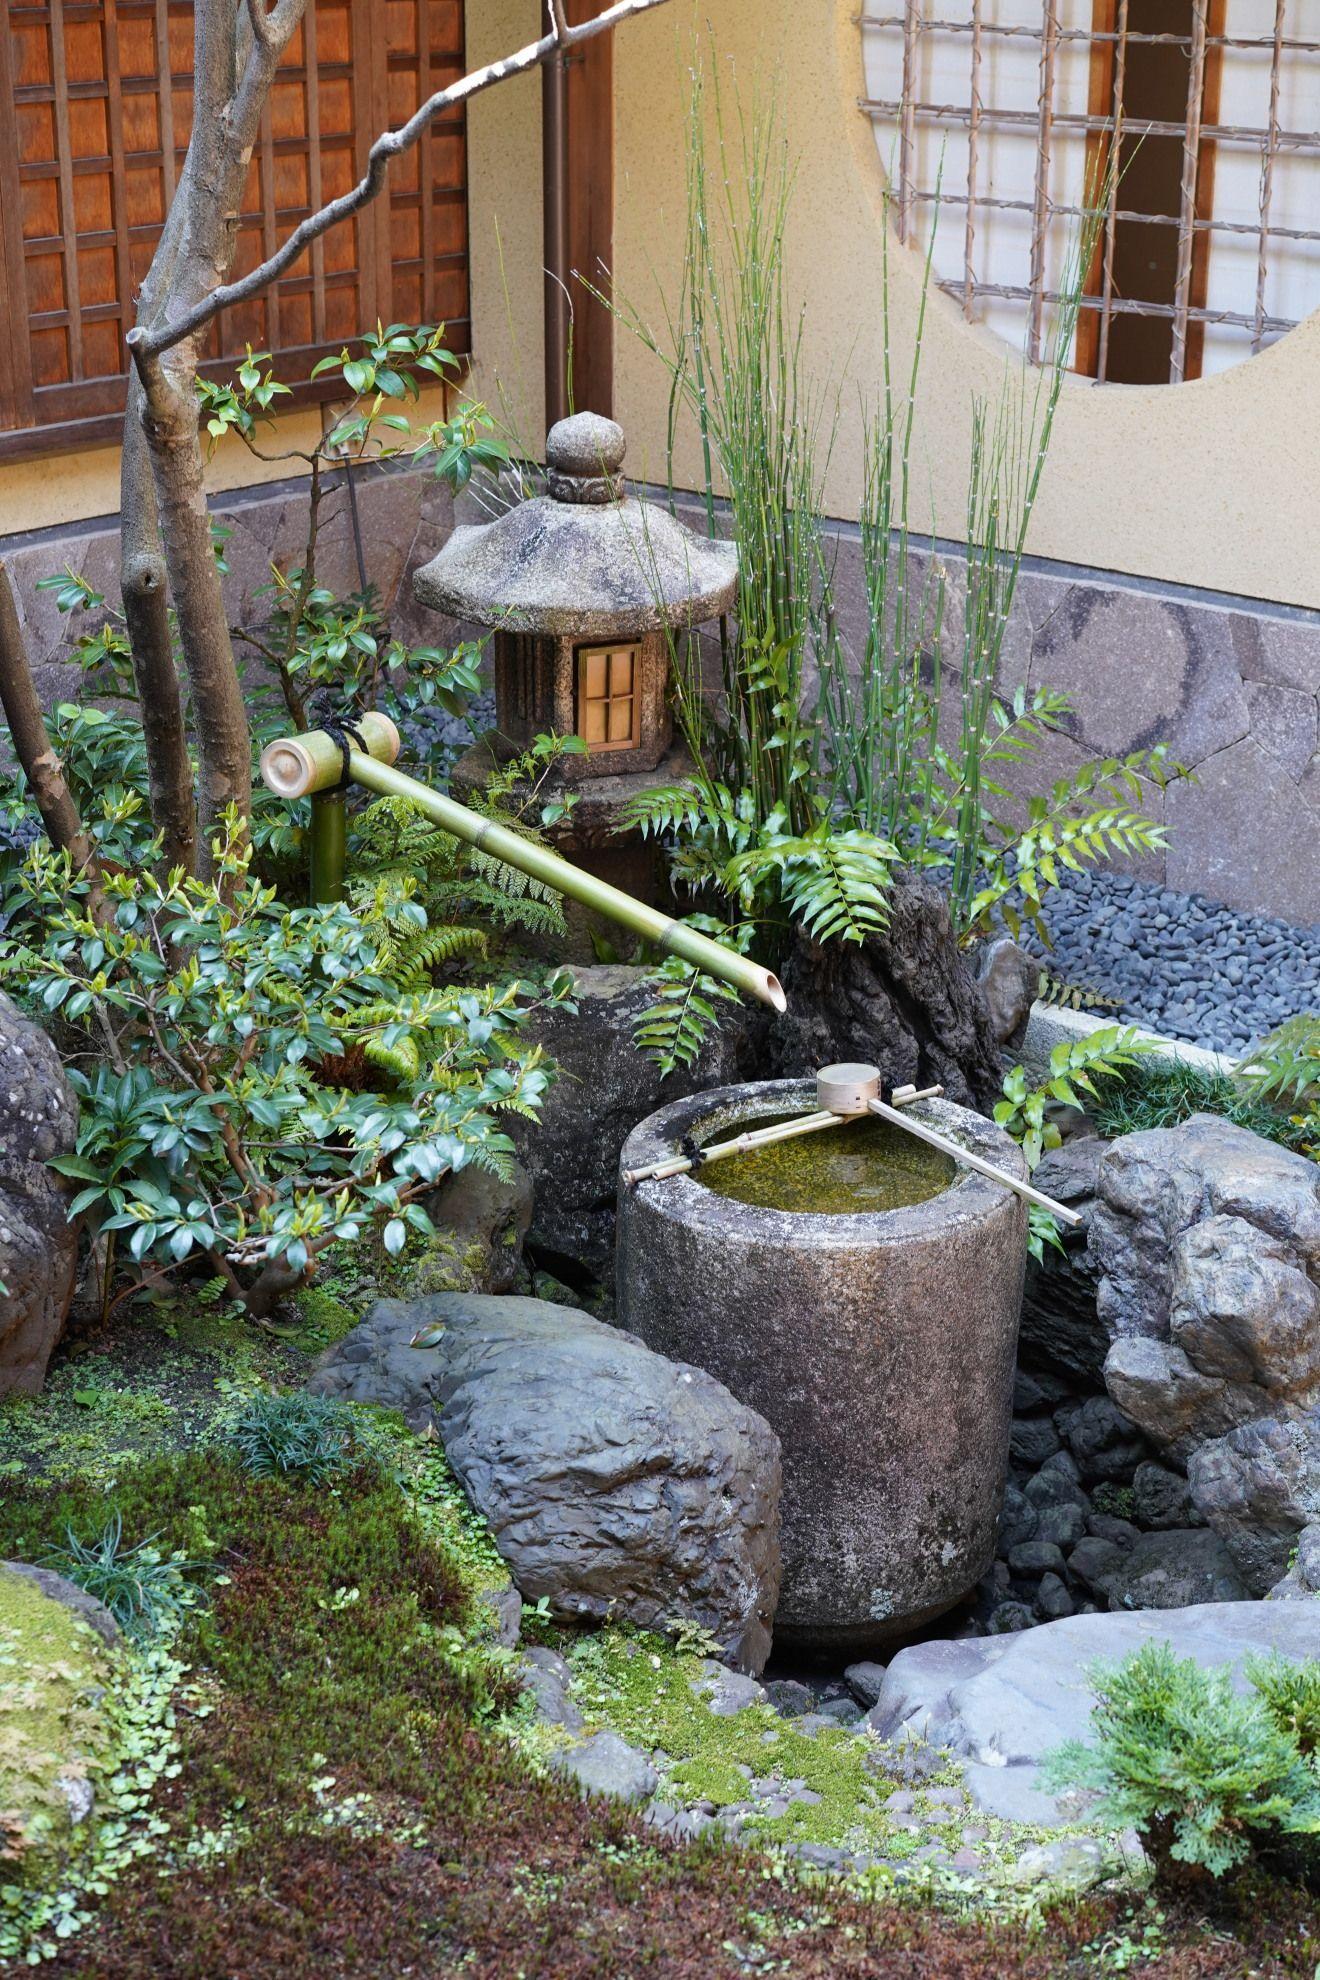 Homaredayagenbei Chouzubachi 譽田屋源兵衛 手水鉢 Asian Garden